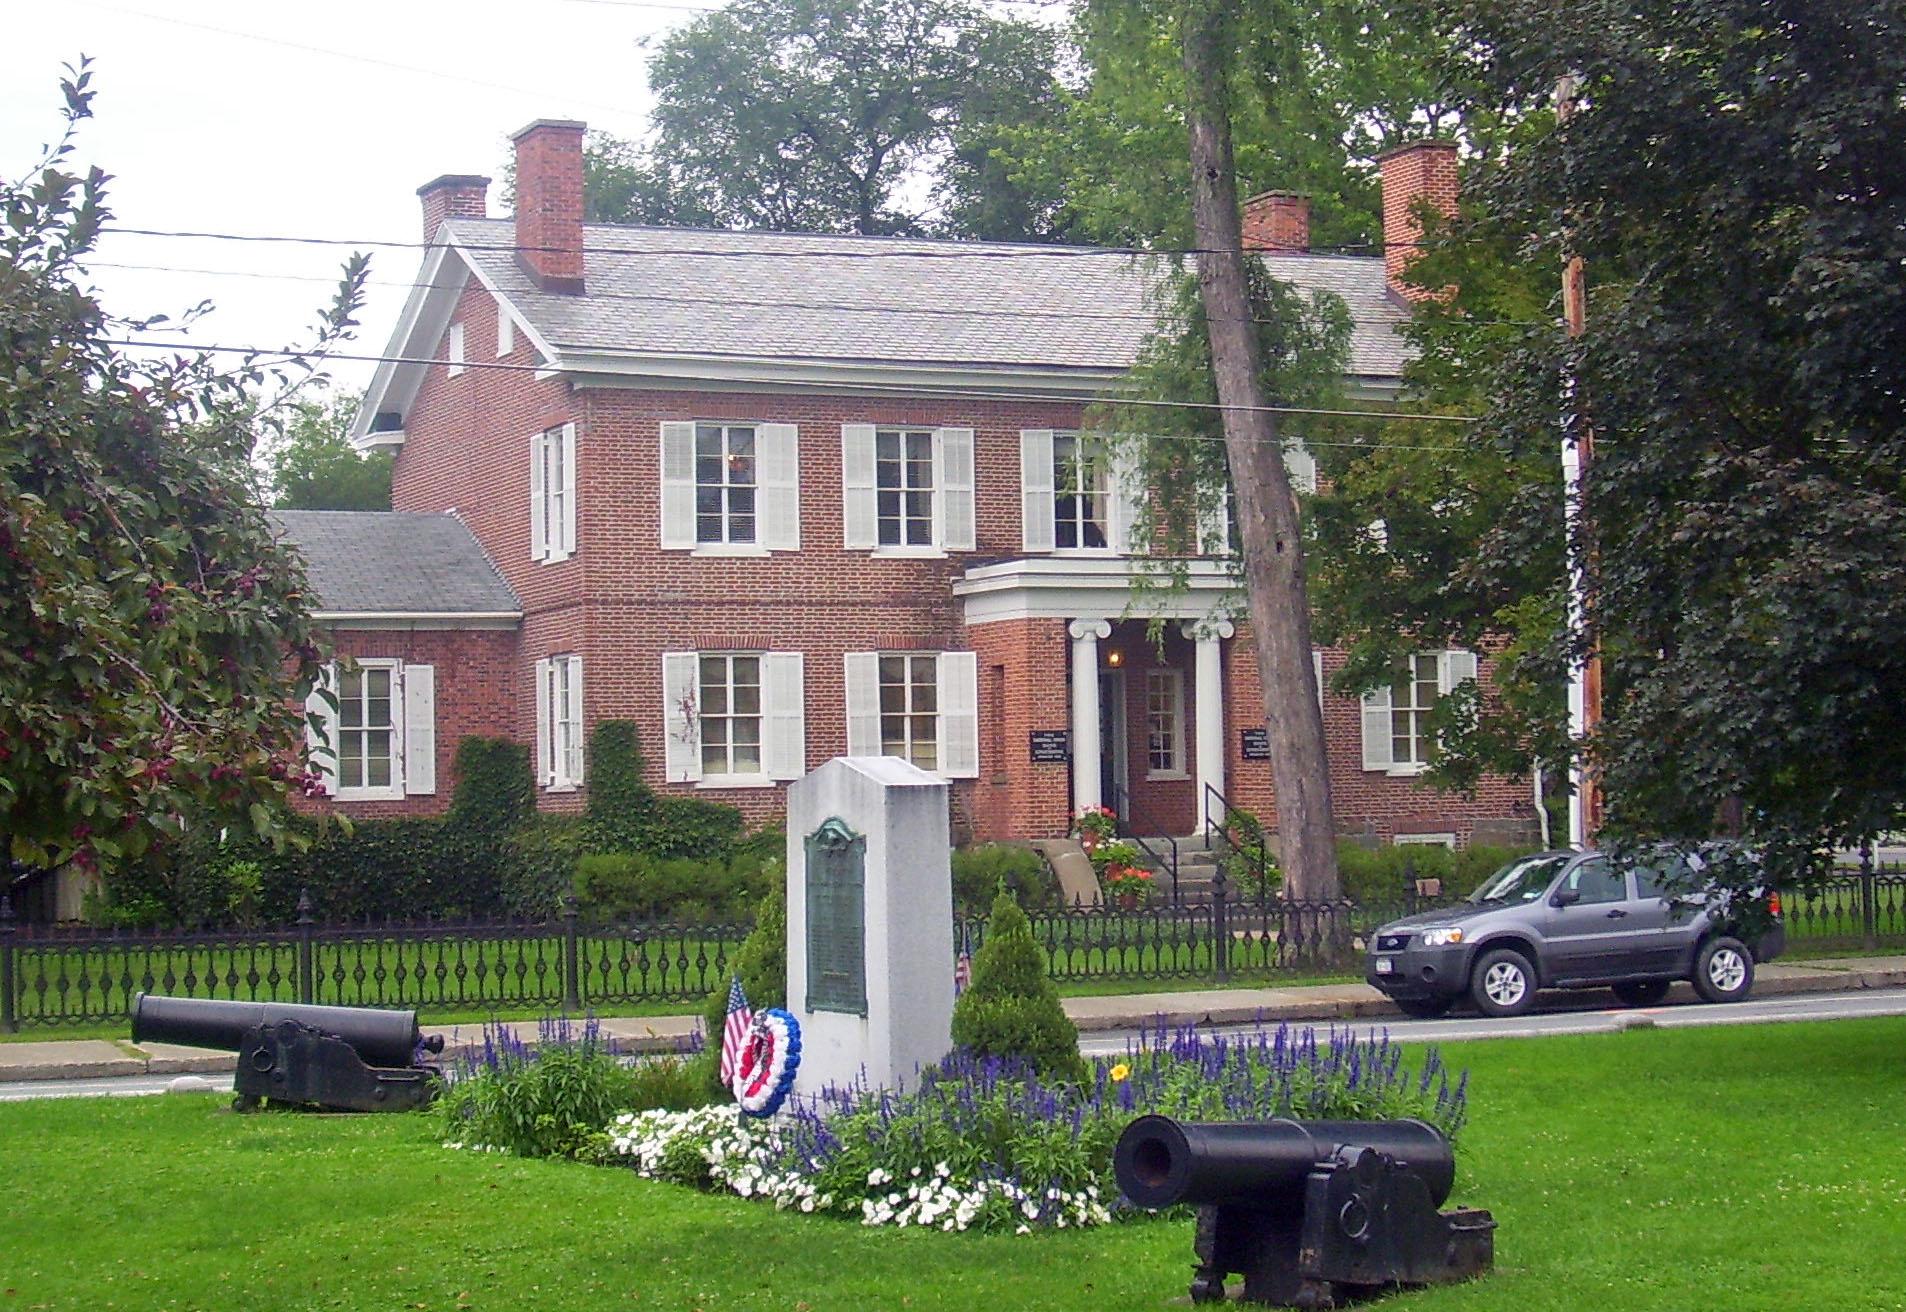 Kinderhook (town), New York - Wikipedia, the free encyclopediakinderhook town